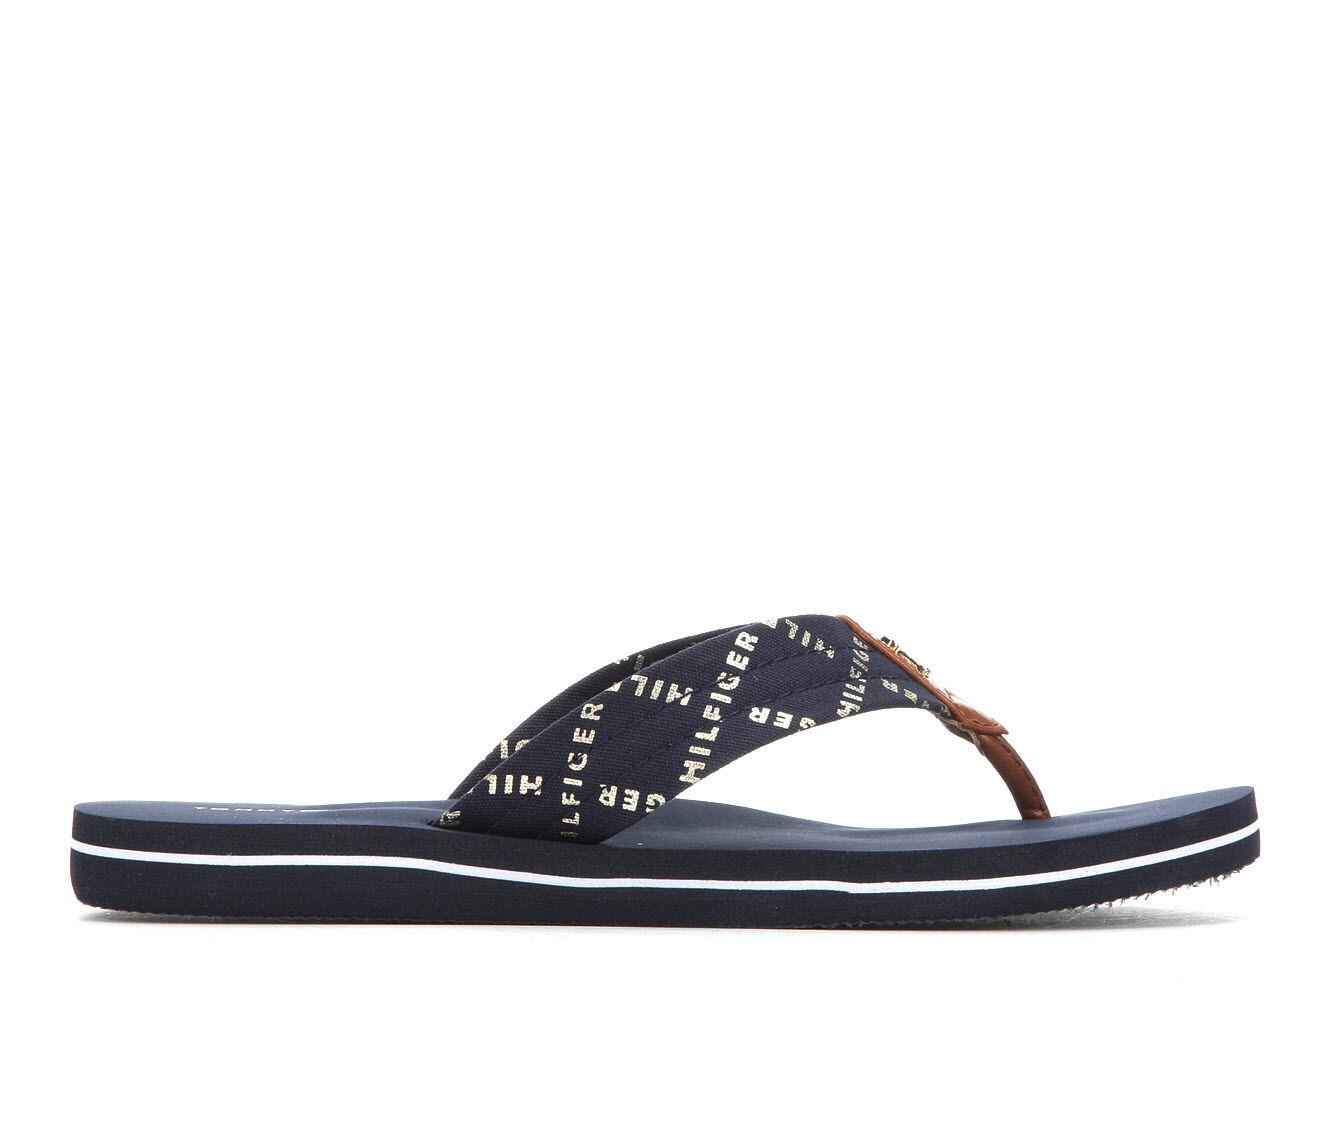 purchase comfortable Women's Tommy Hilfiger Carper2 Sandals Navy